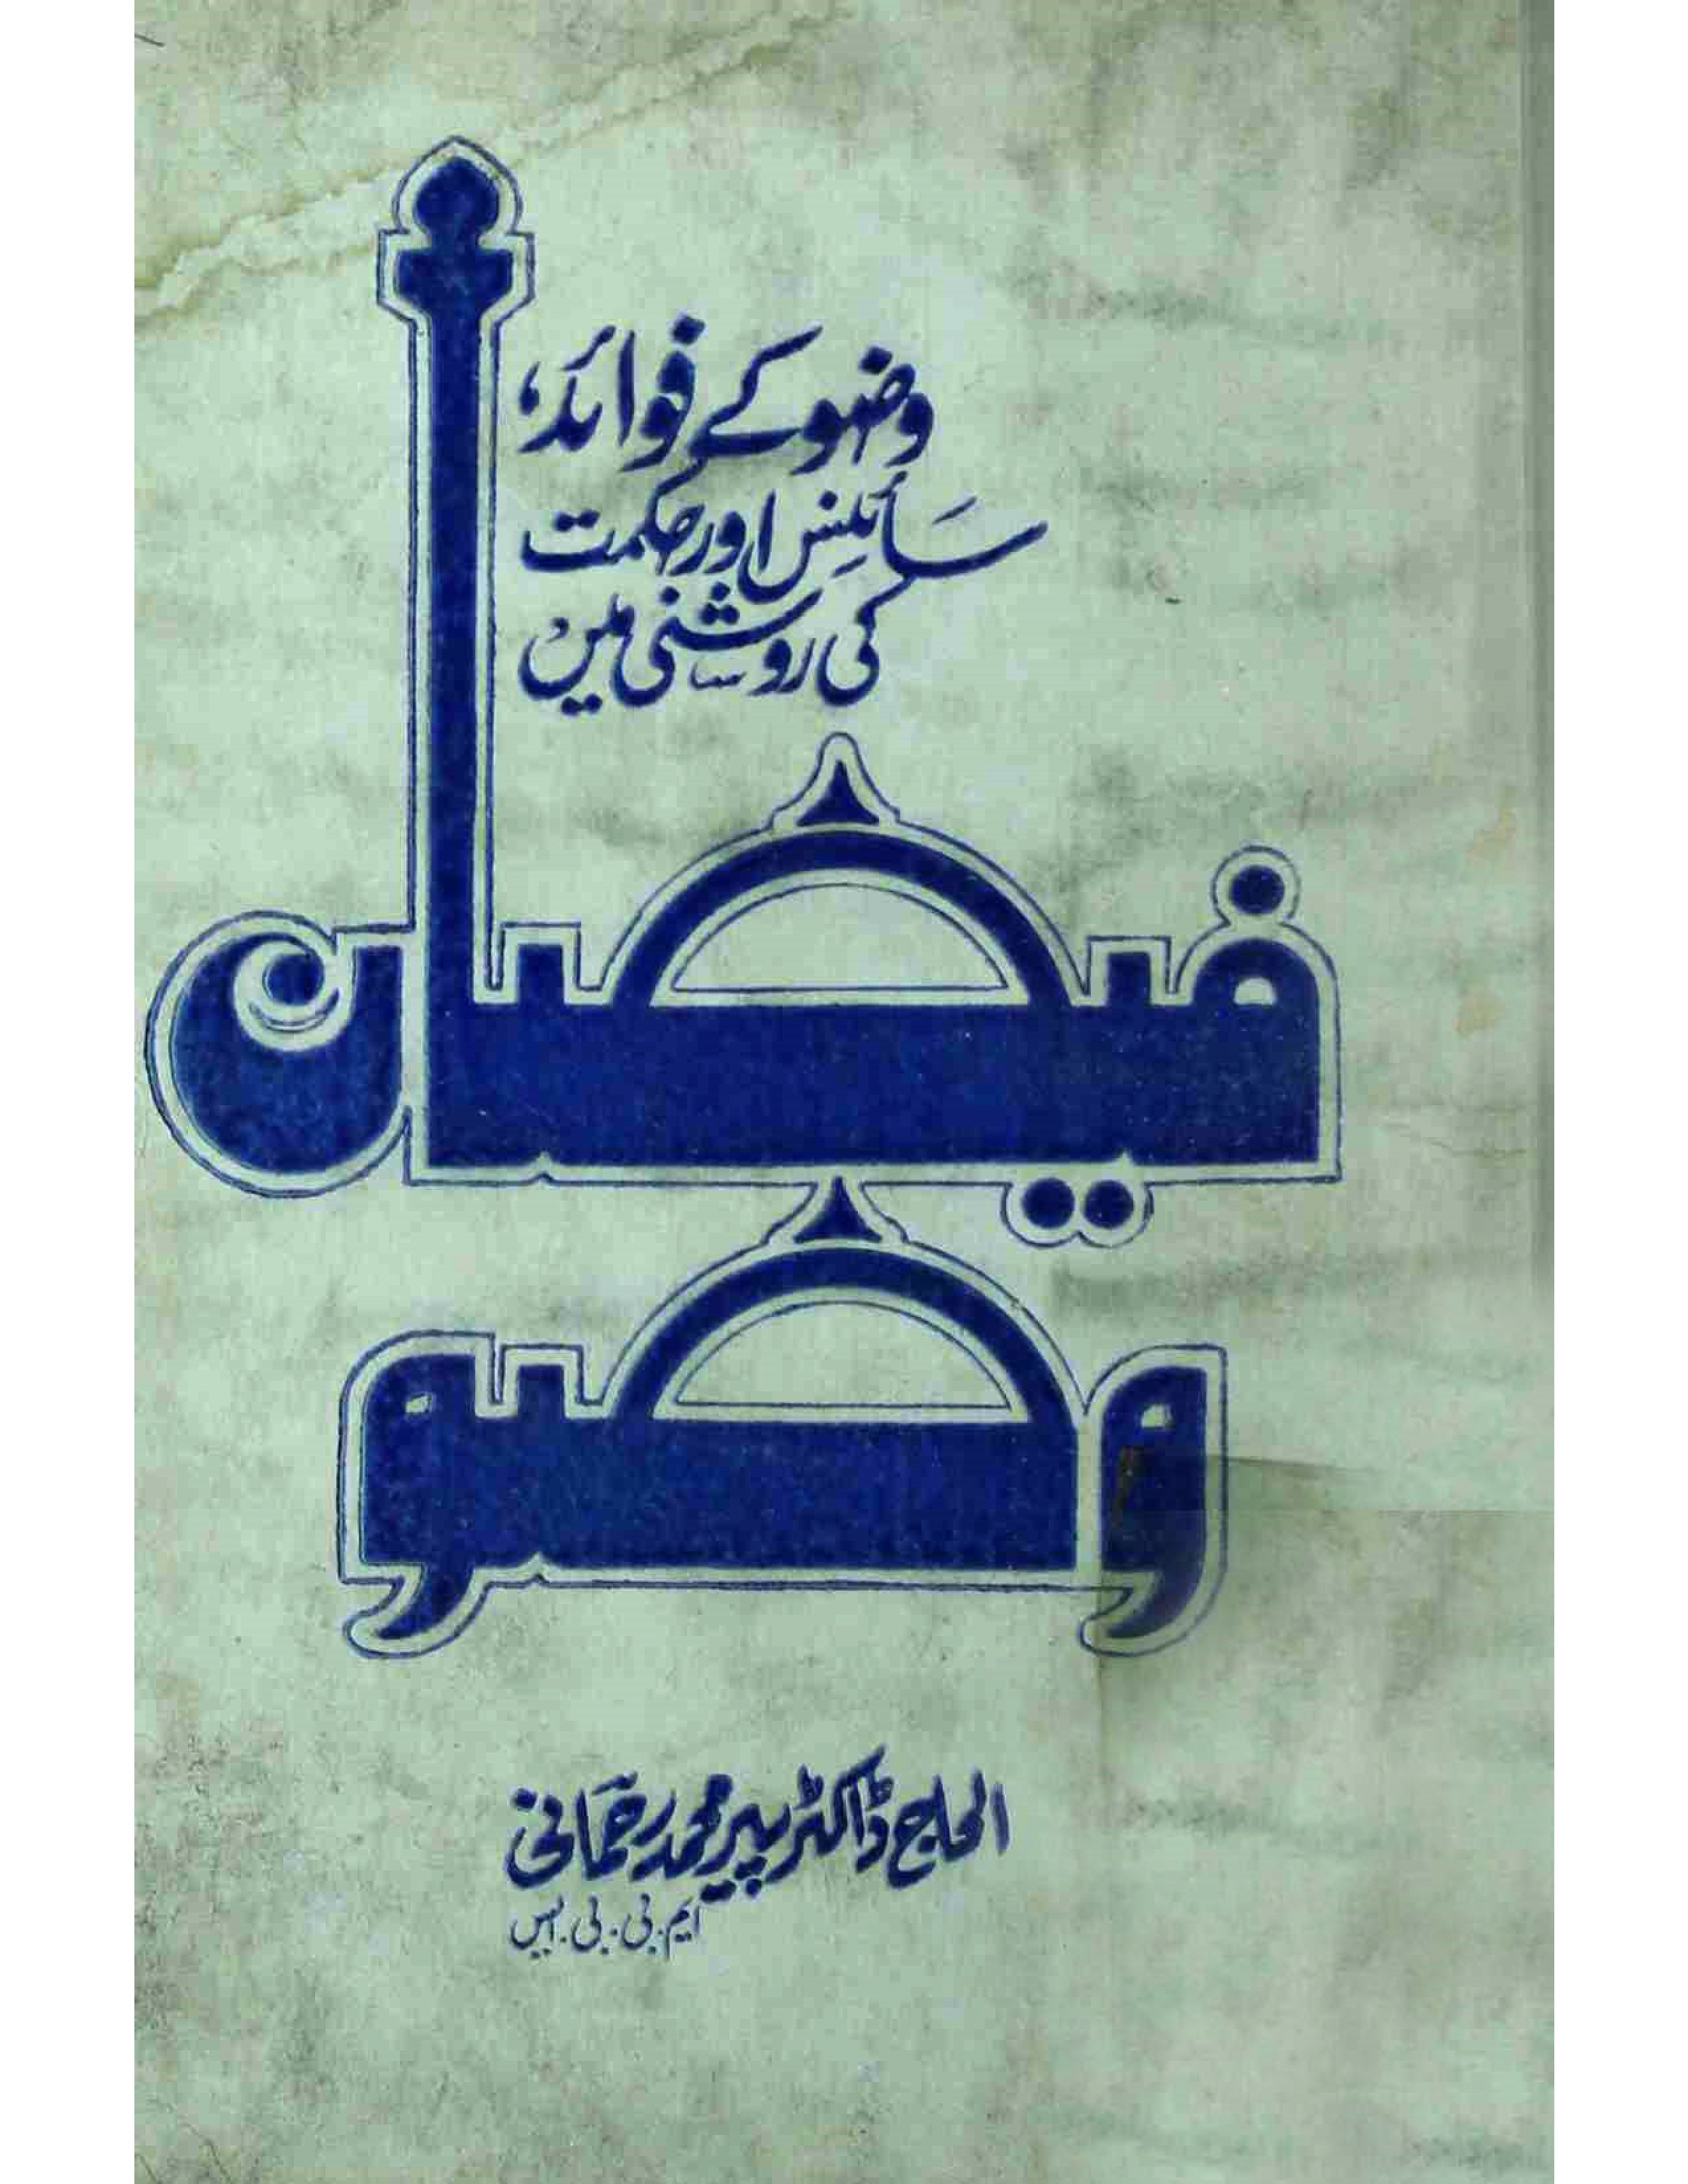 Faizan-e-Wazu